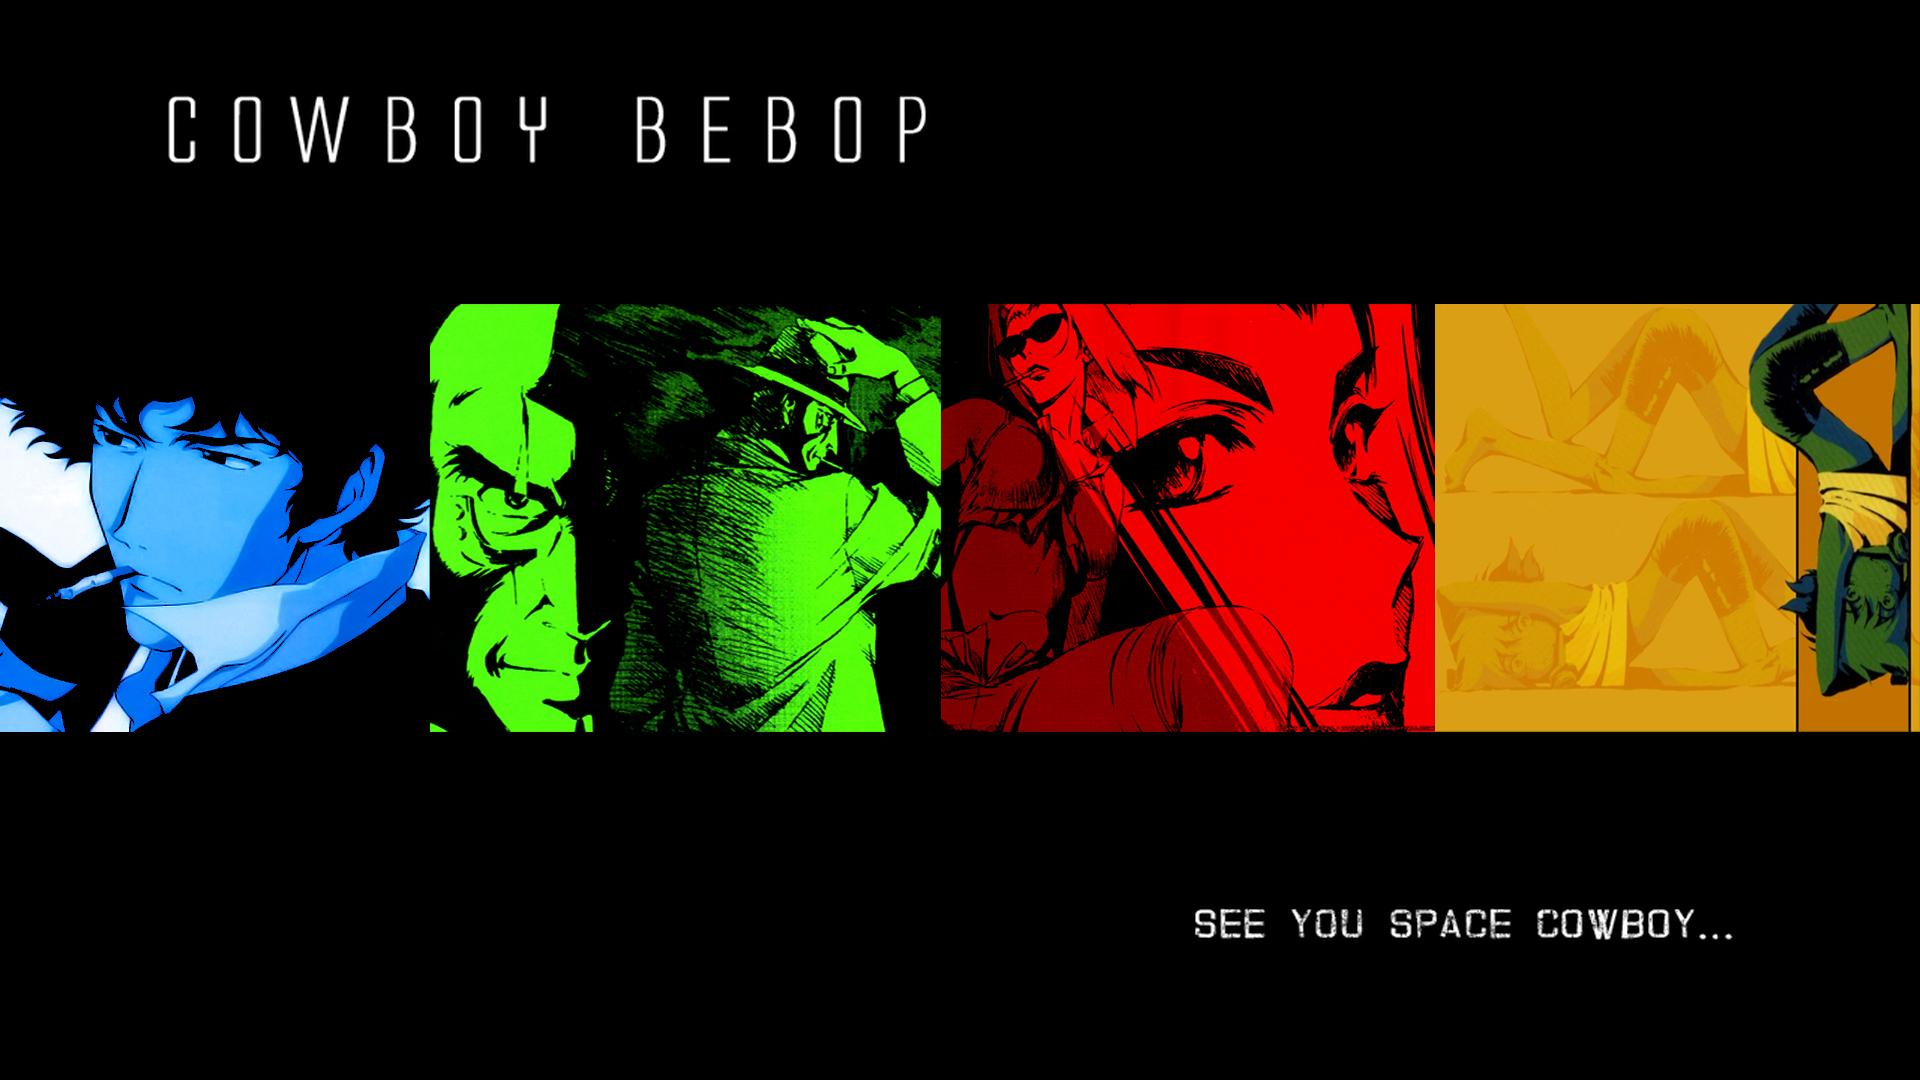 Cowboy Bebop Iphone X Wallpaper Cowboy Bebop Full Hd Wallpaper And Background Image